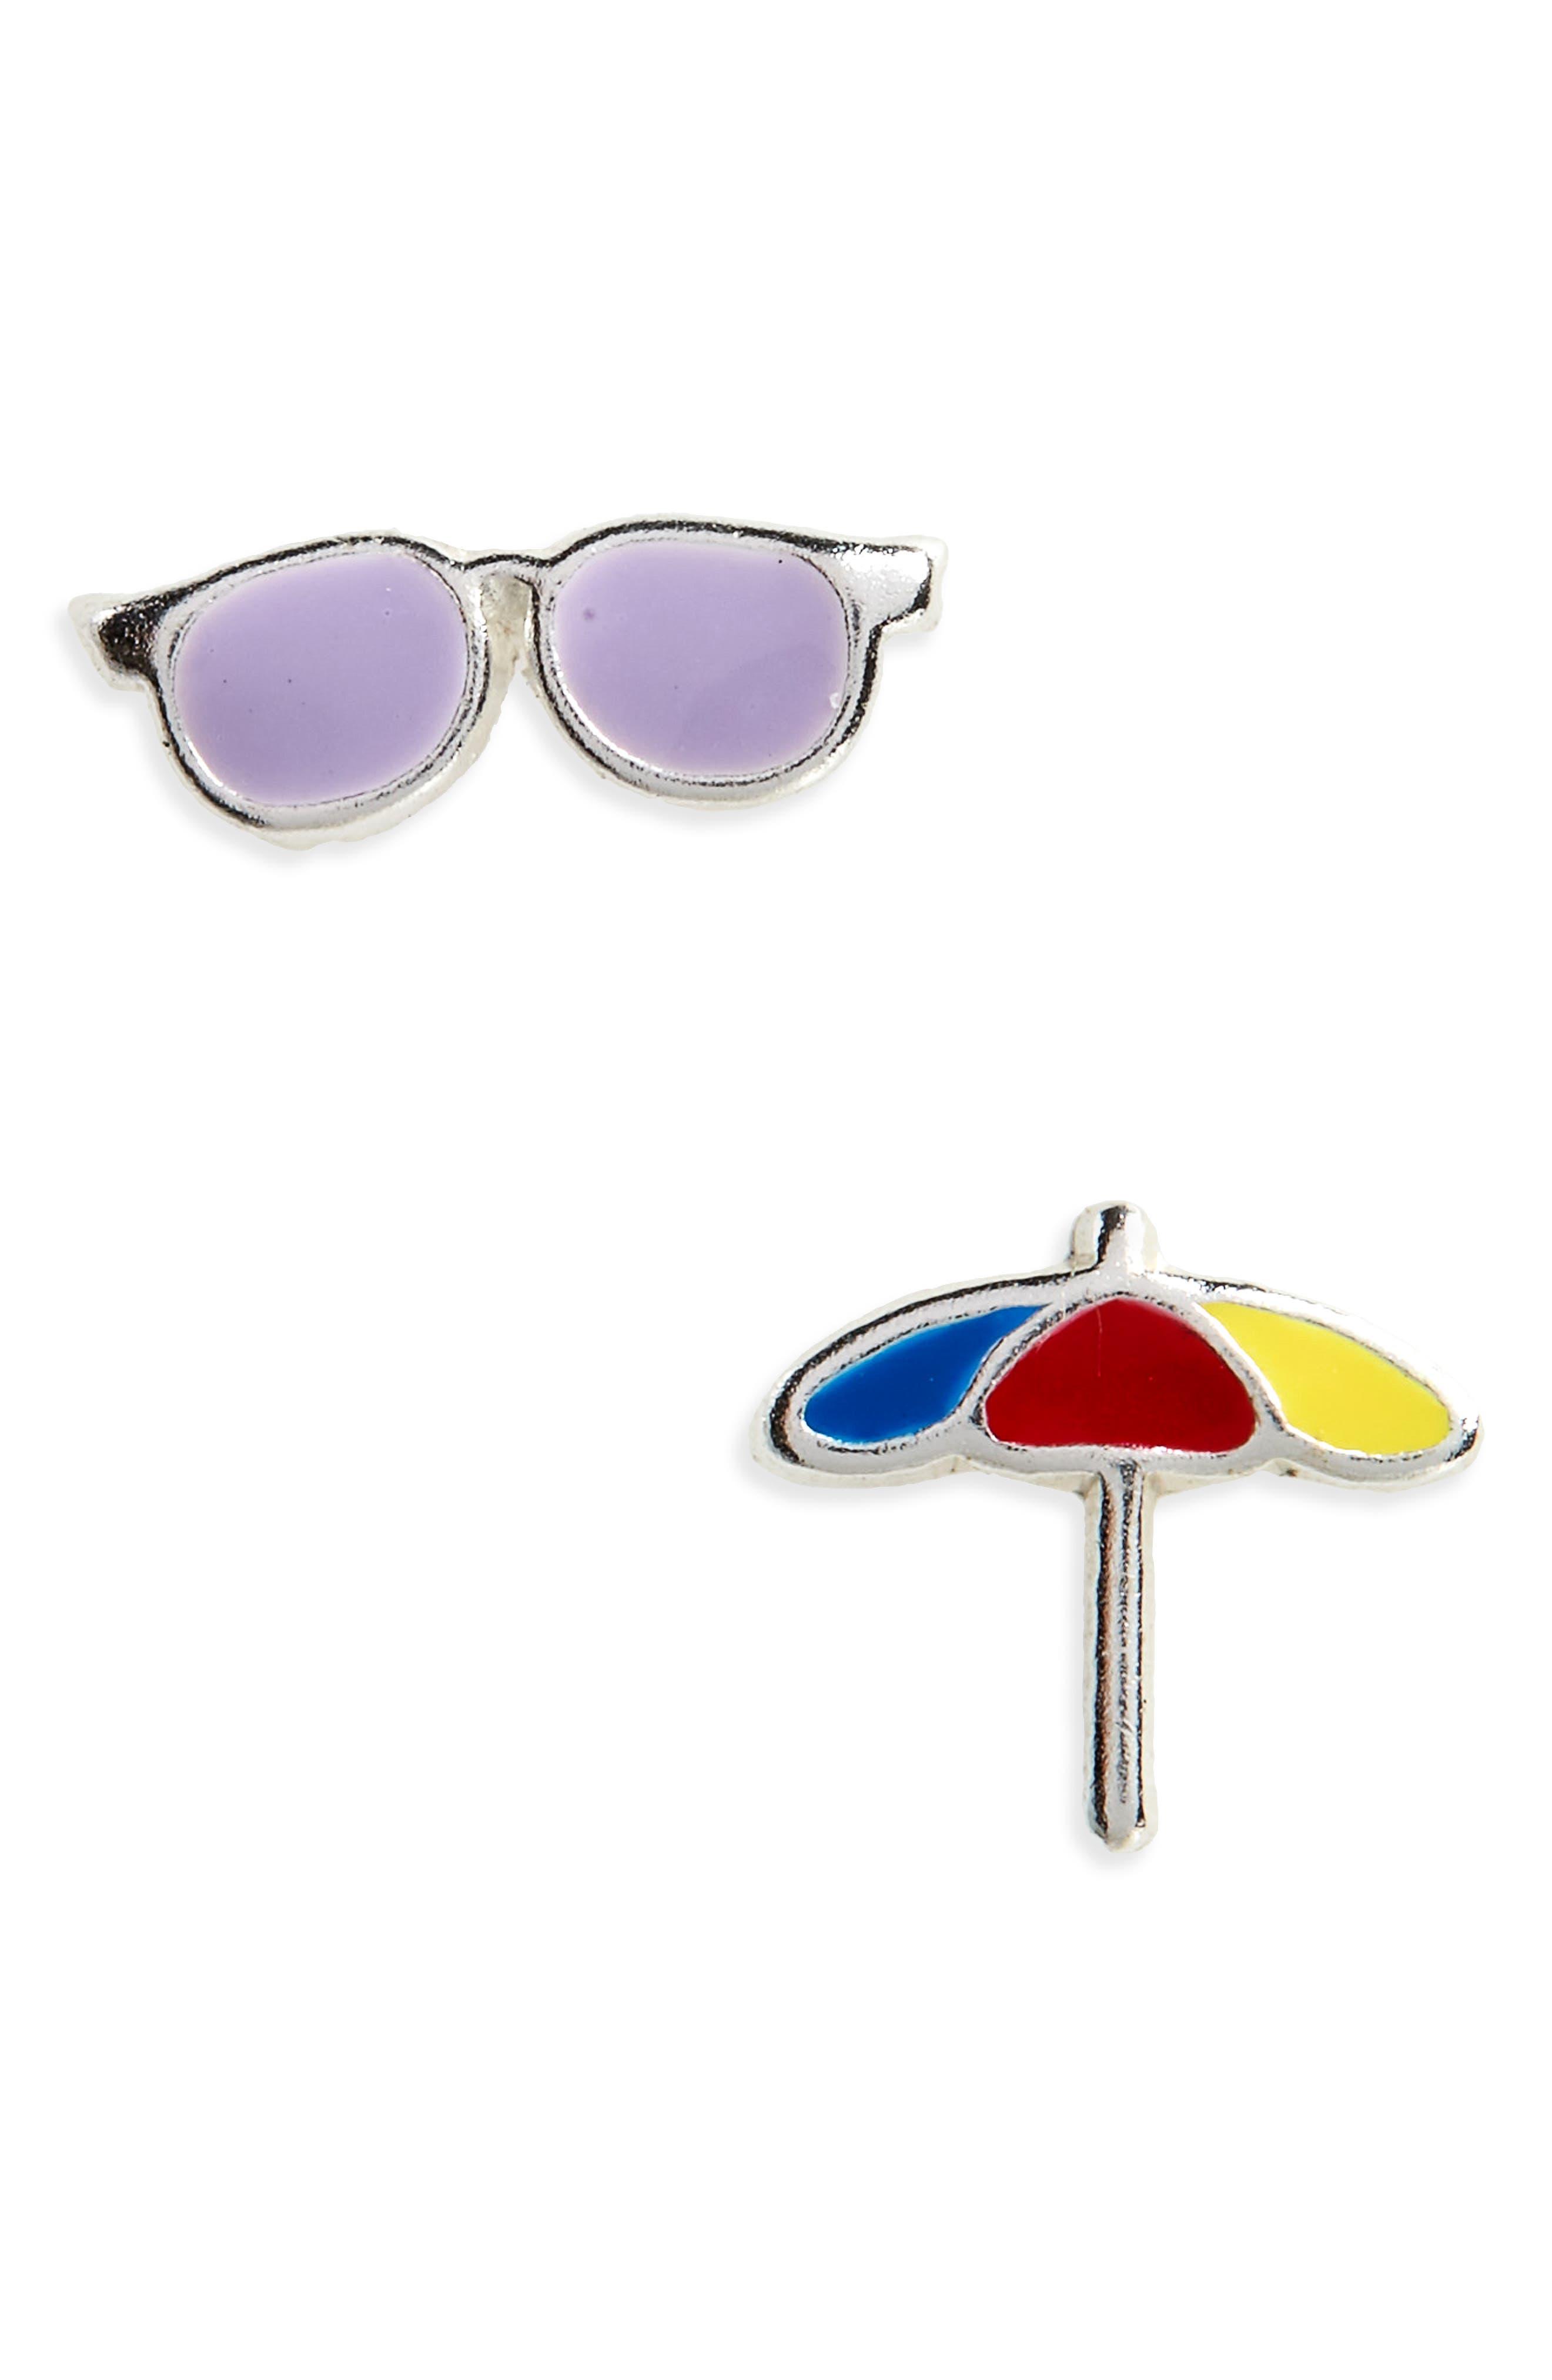 Tomas Sunglasses & Beach Umbrella Sterling Silver Stud Earrings (Girls)